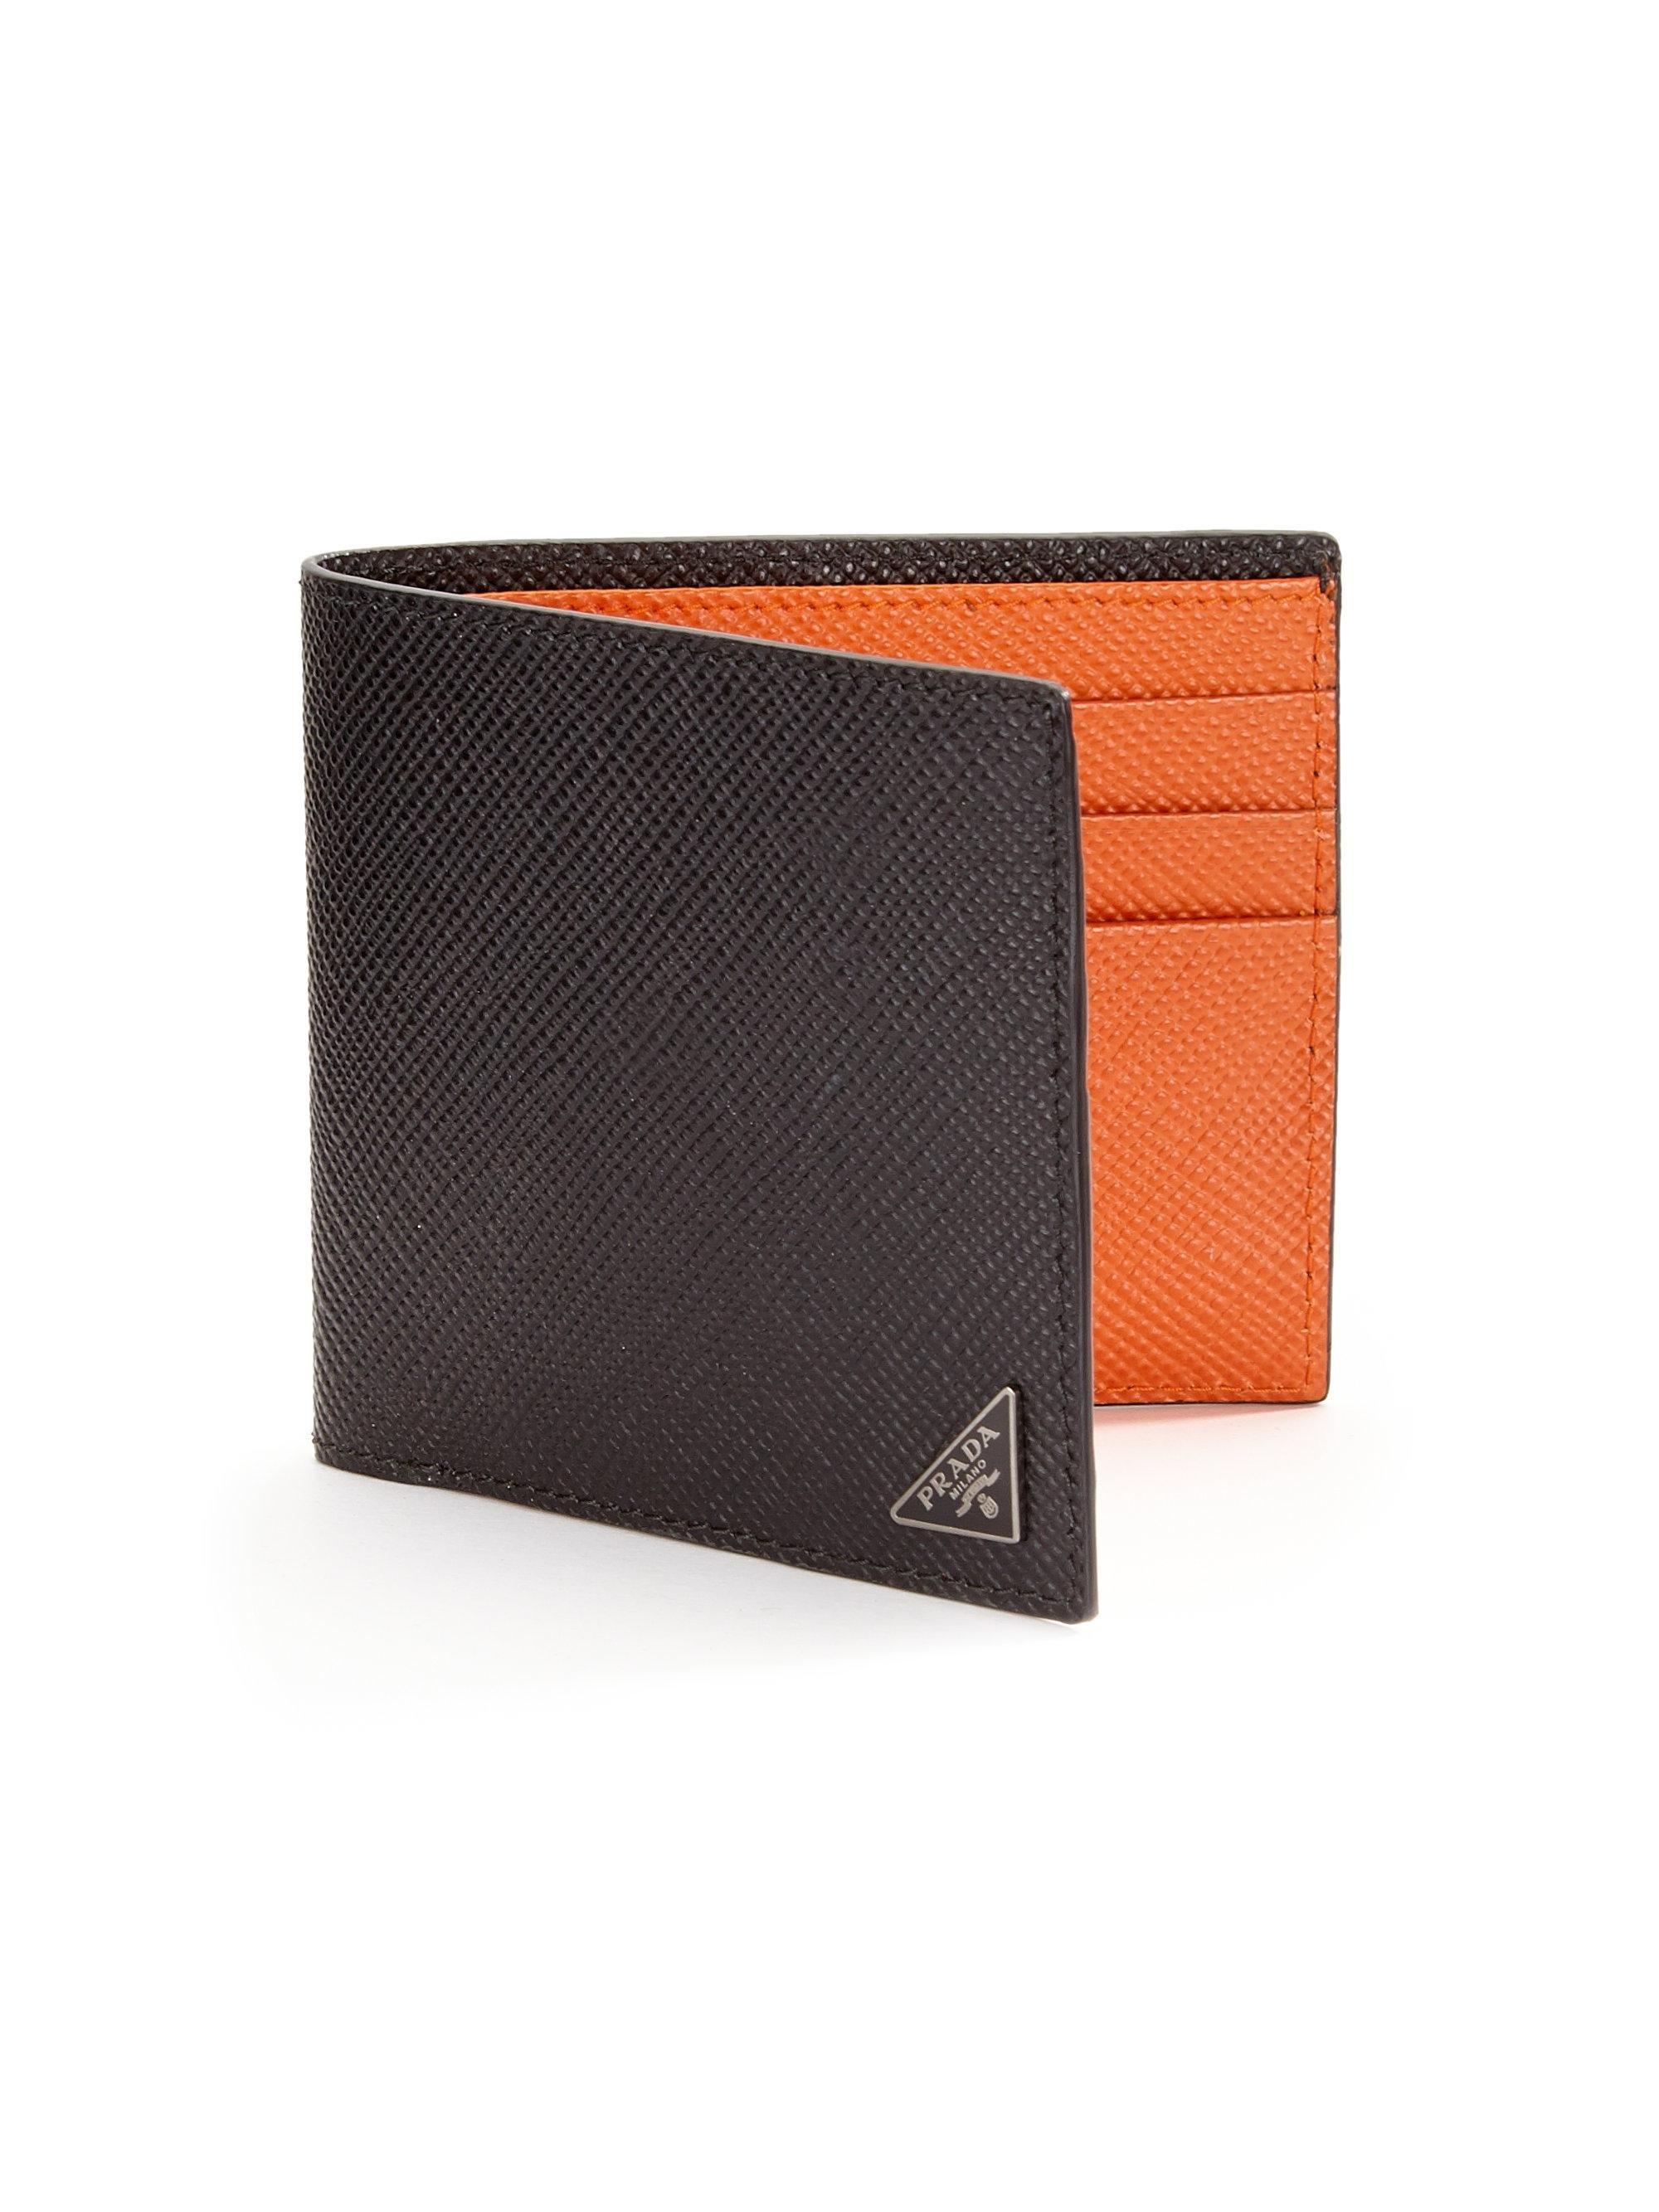 93e35125eb8857 Prada Orizzontale Wallet in Orange for Men - Lyst